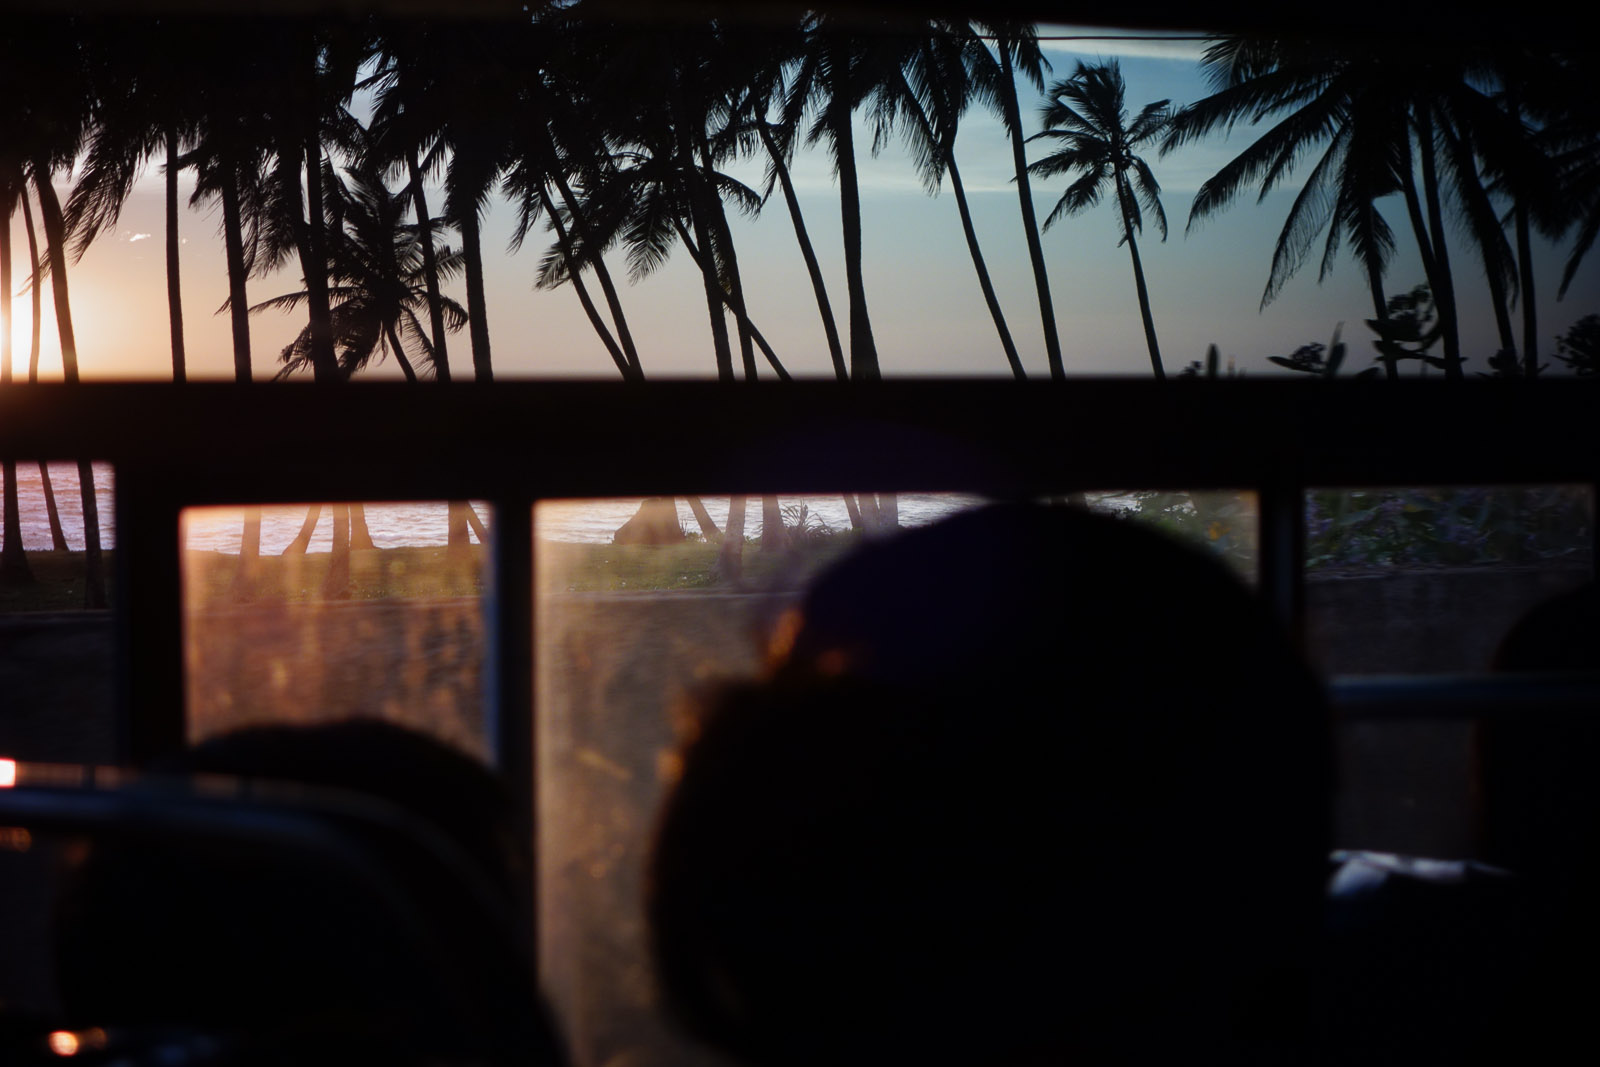 Sunshinestories-surf-travel-blog-DSC03540